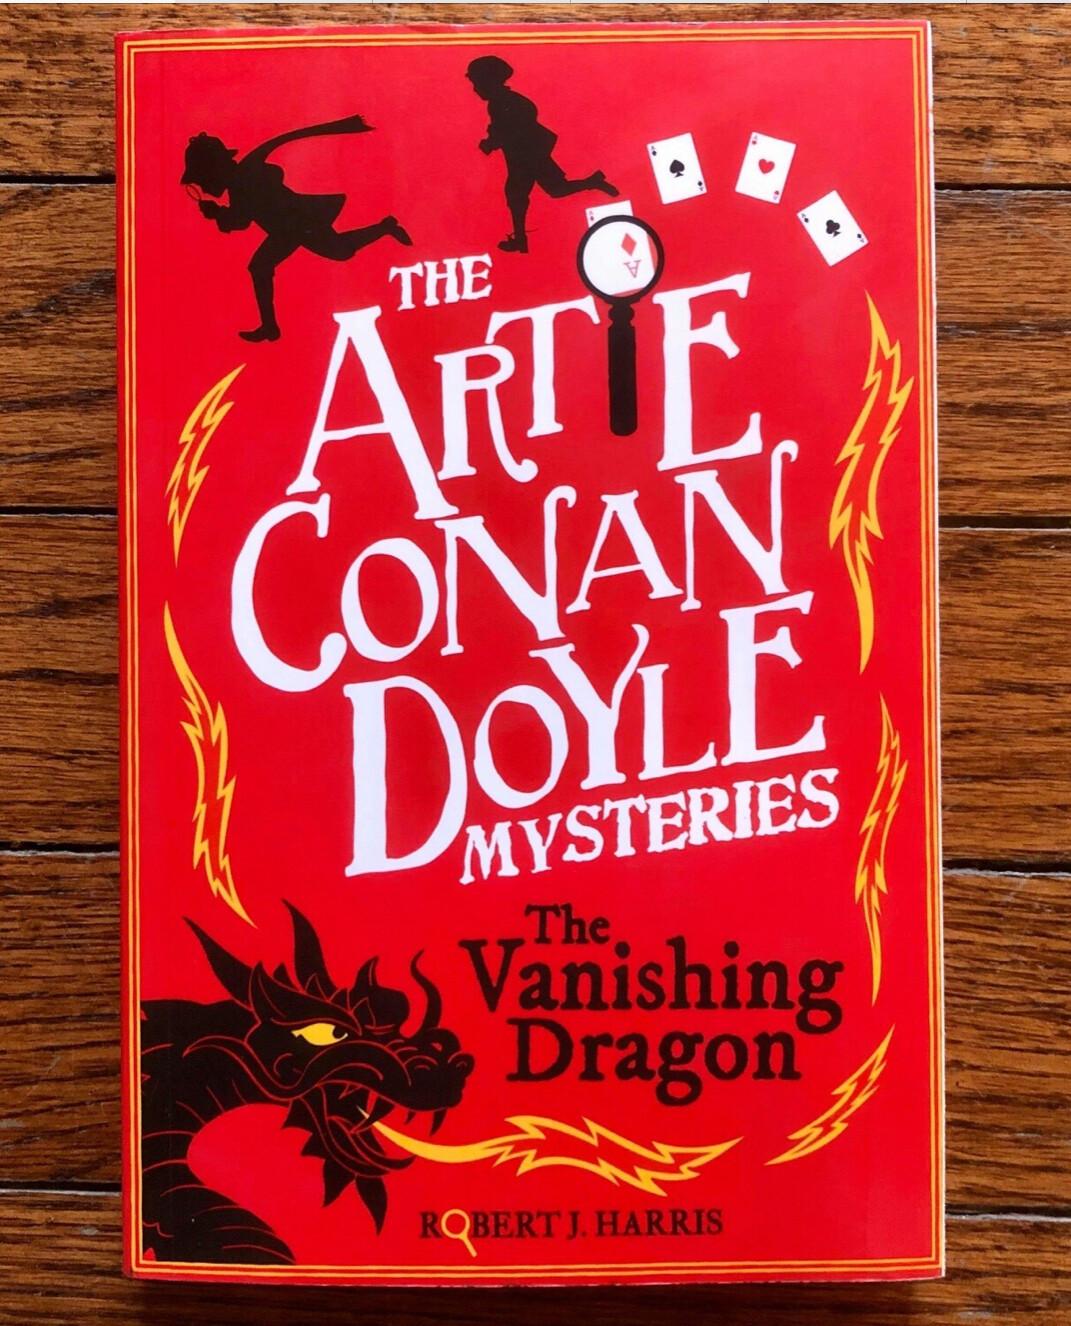 Artie Conan Doyle Mysteries Vanishing Dragons - B4832